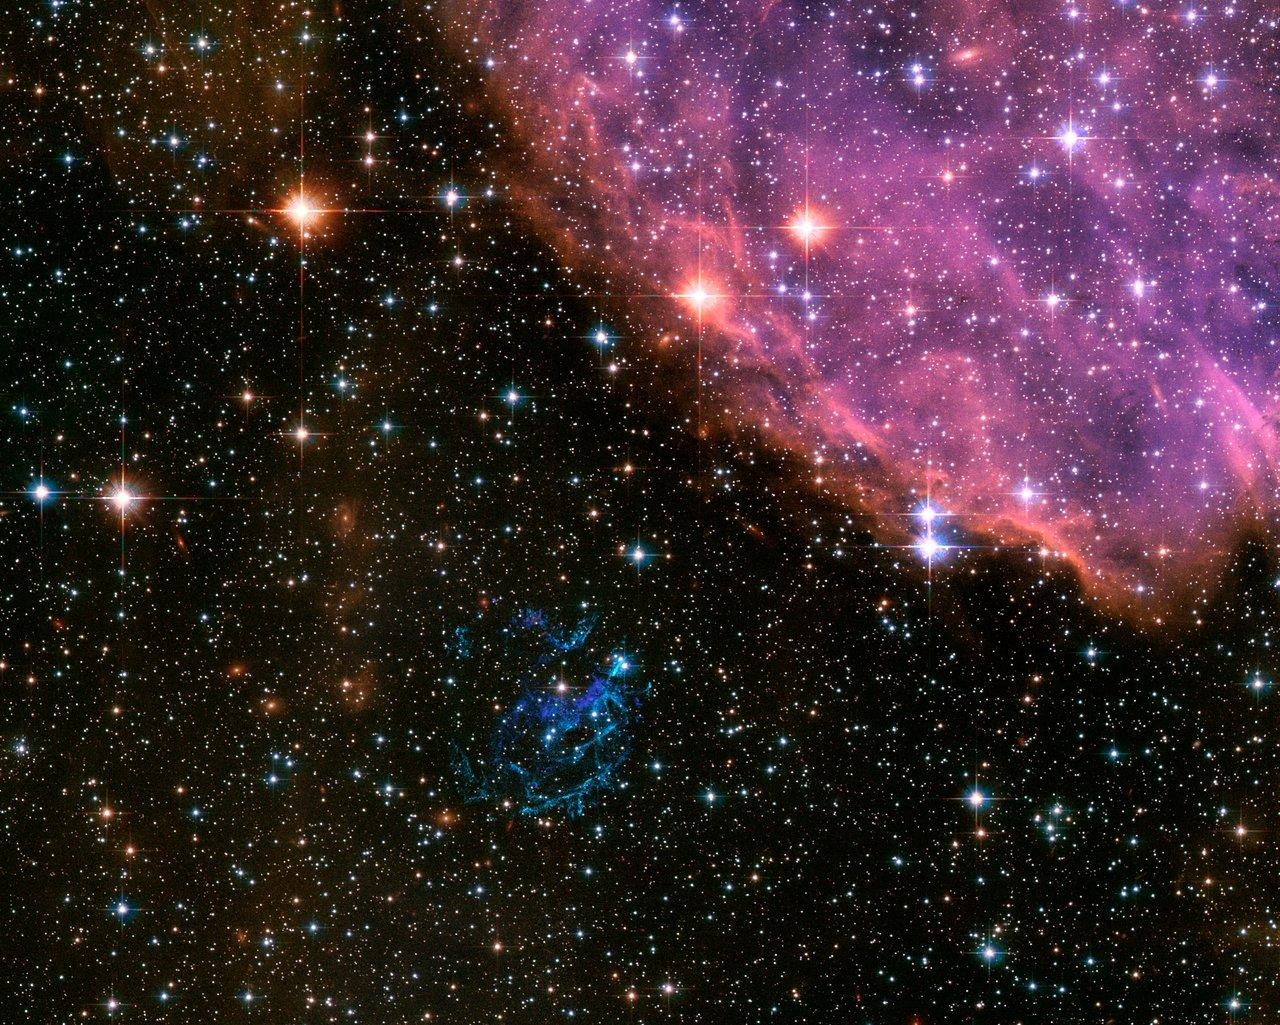 Extraterrestrial Fireworks | ESA/Hubble